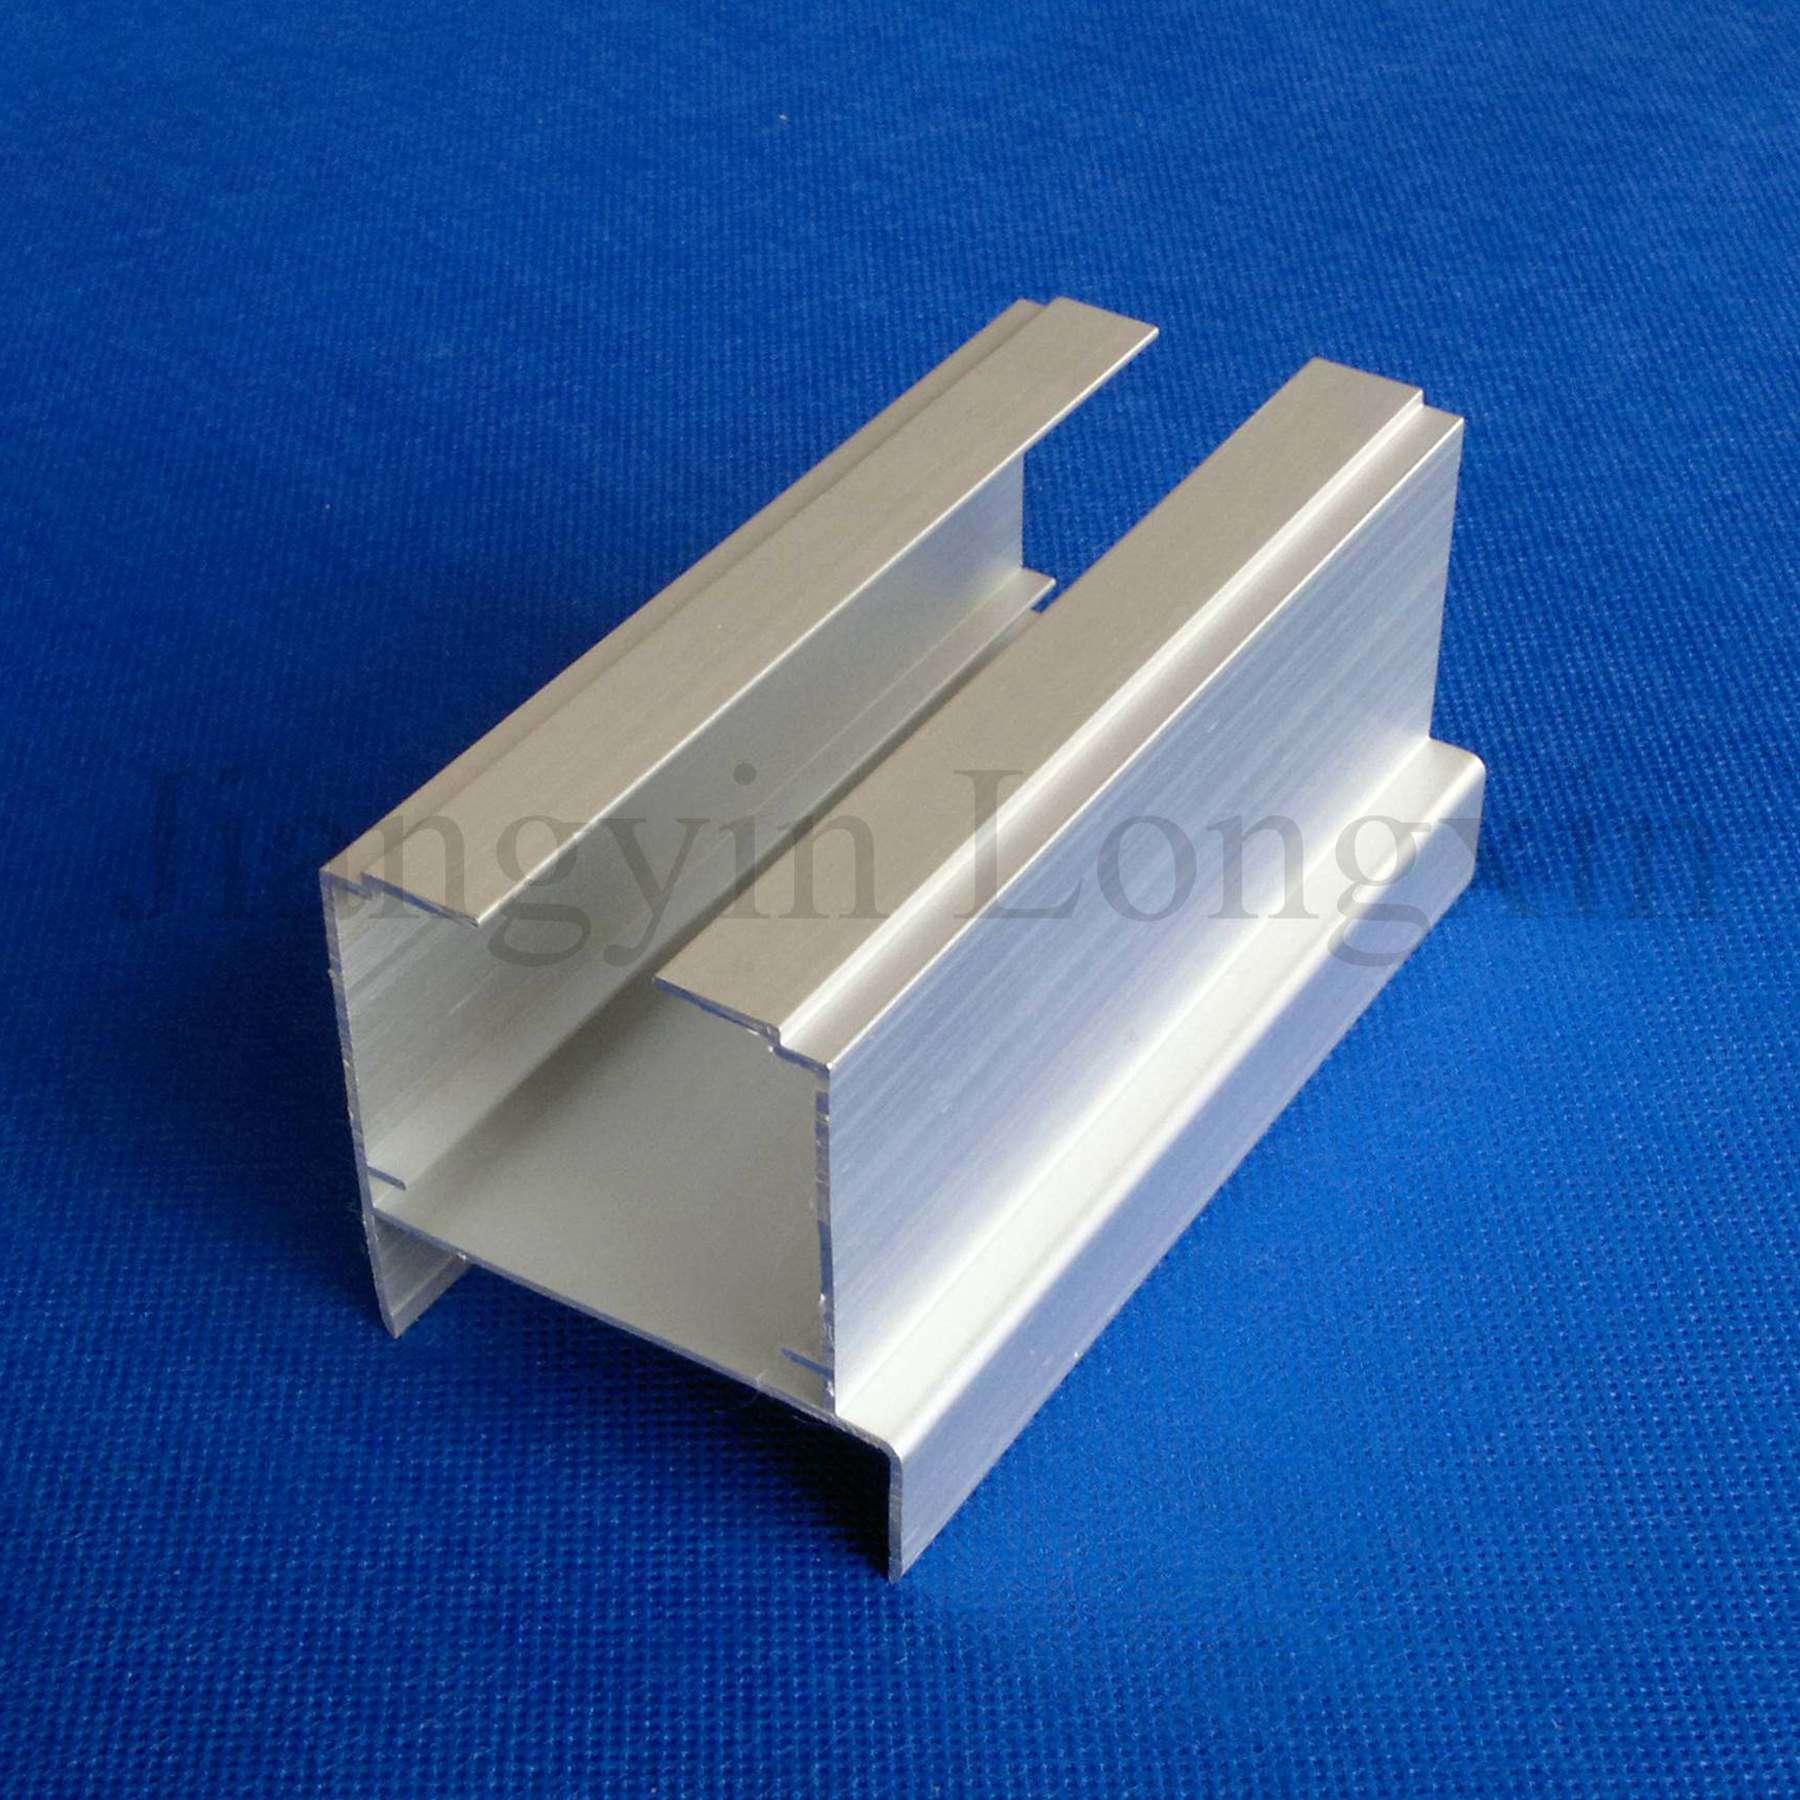 Foto de perfil de aluminio anodizado natural como carril - Perfil aluminio anodizado ...